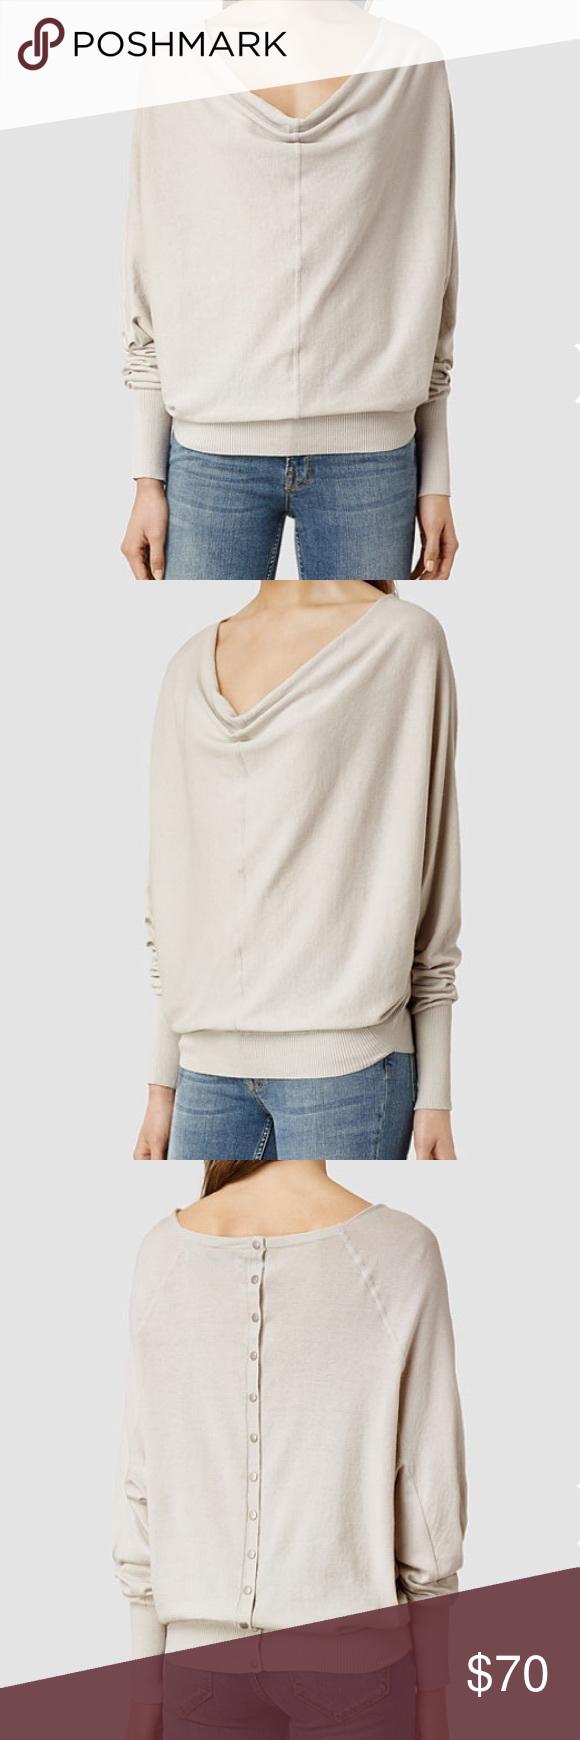 All Saints Elgar cowl neck cream sweater sz S | Cowl neck, Retail ...